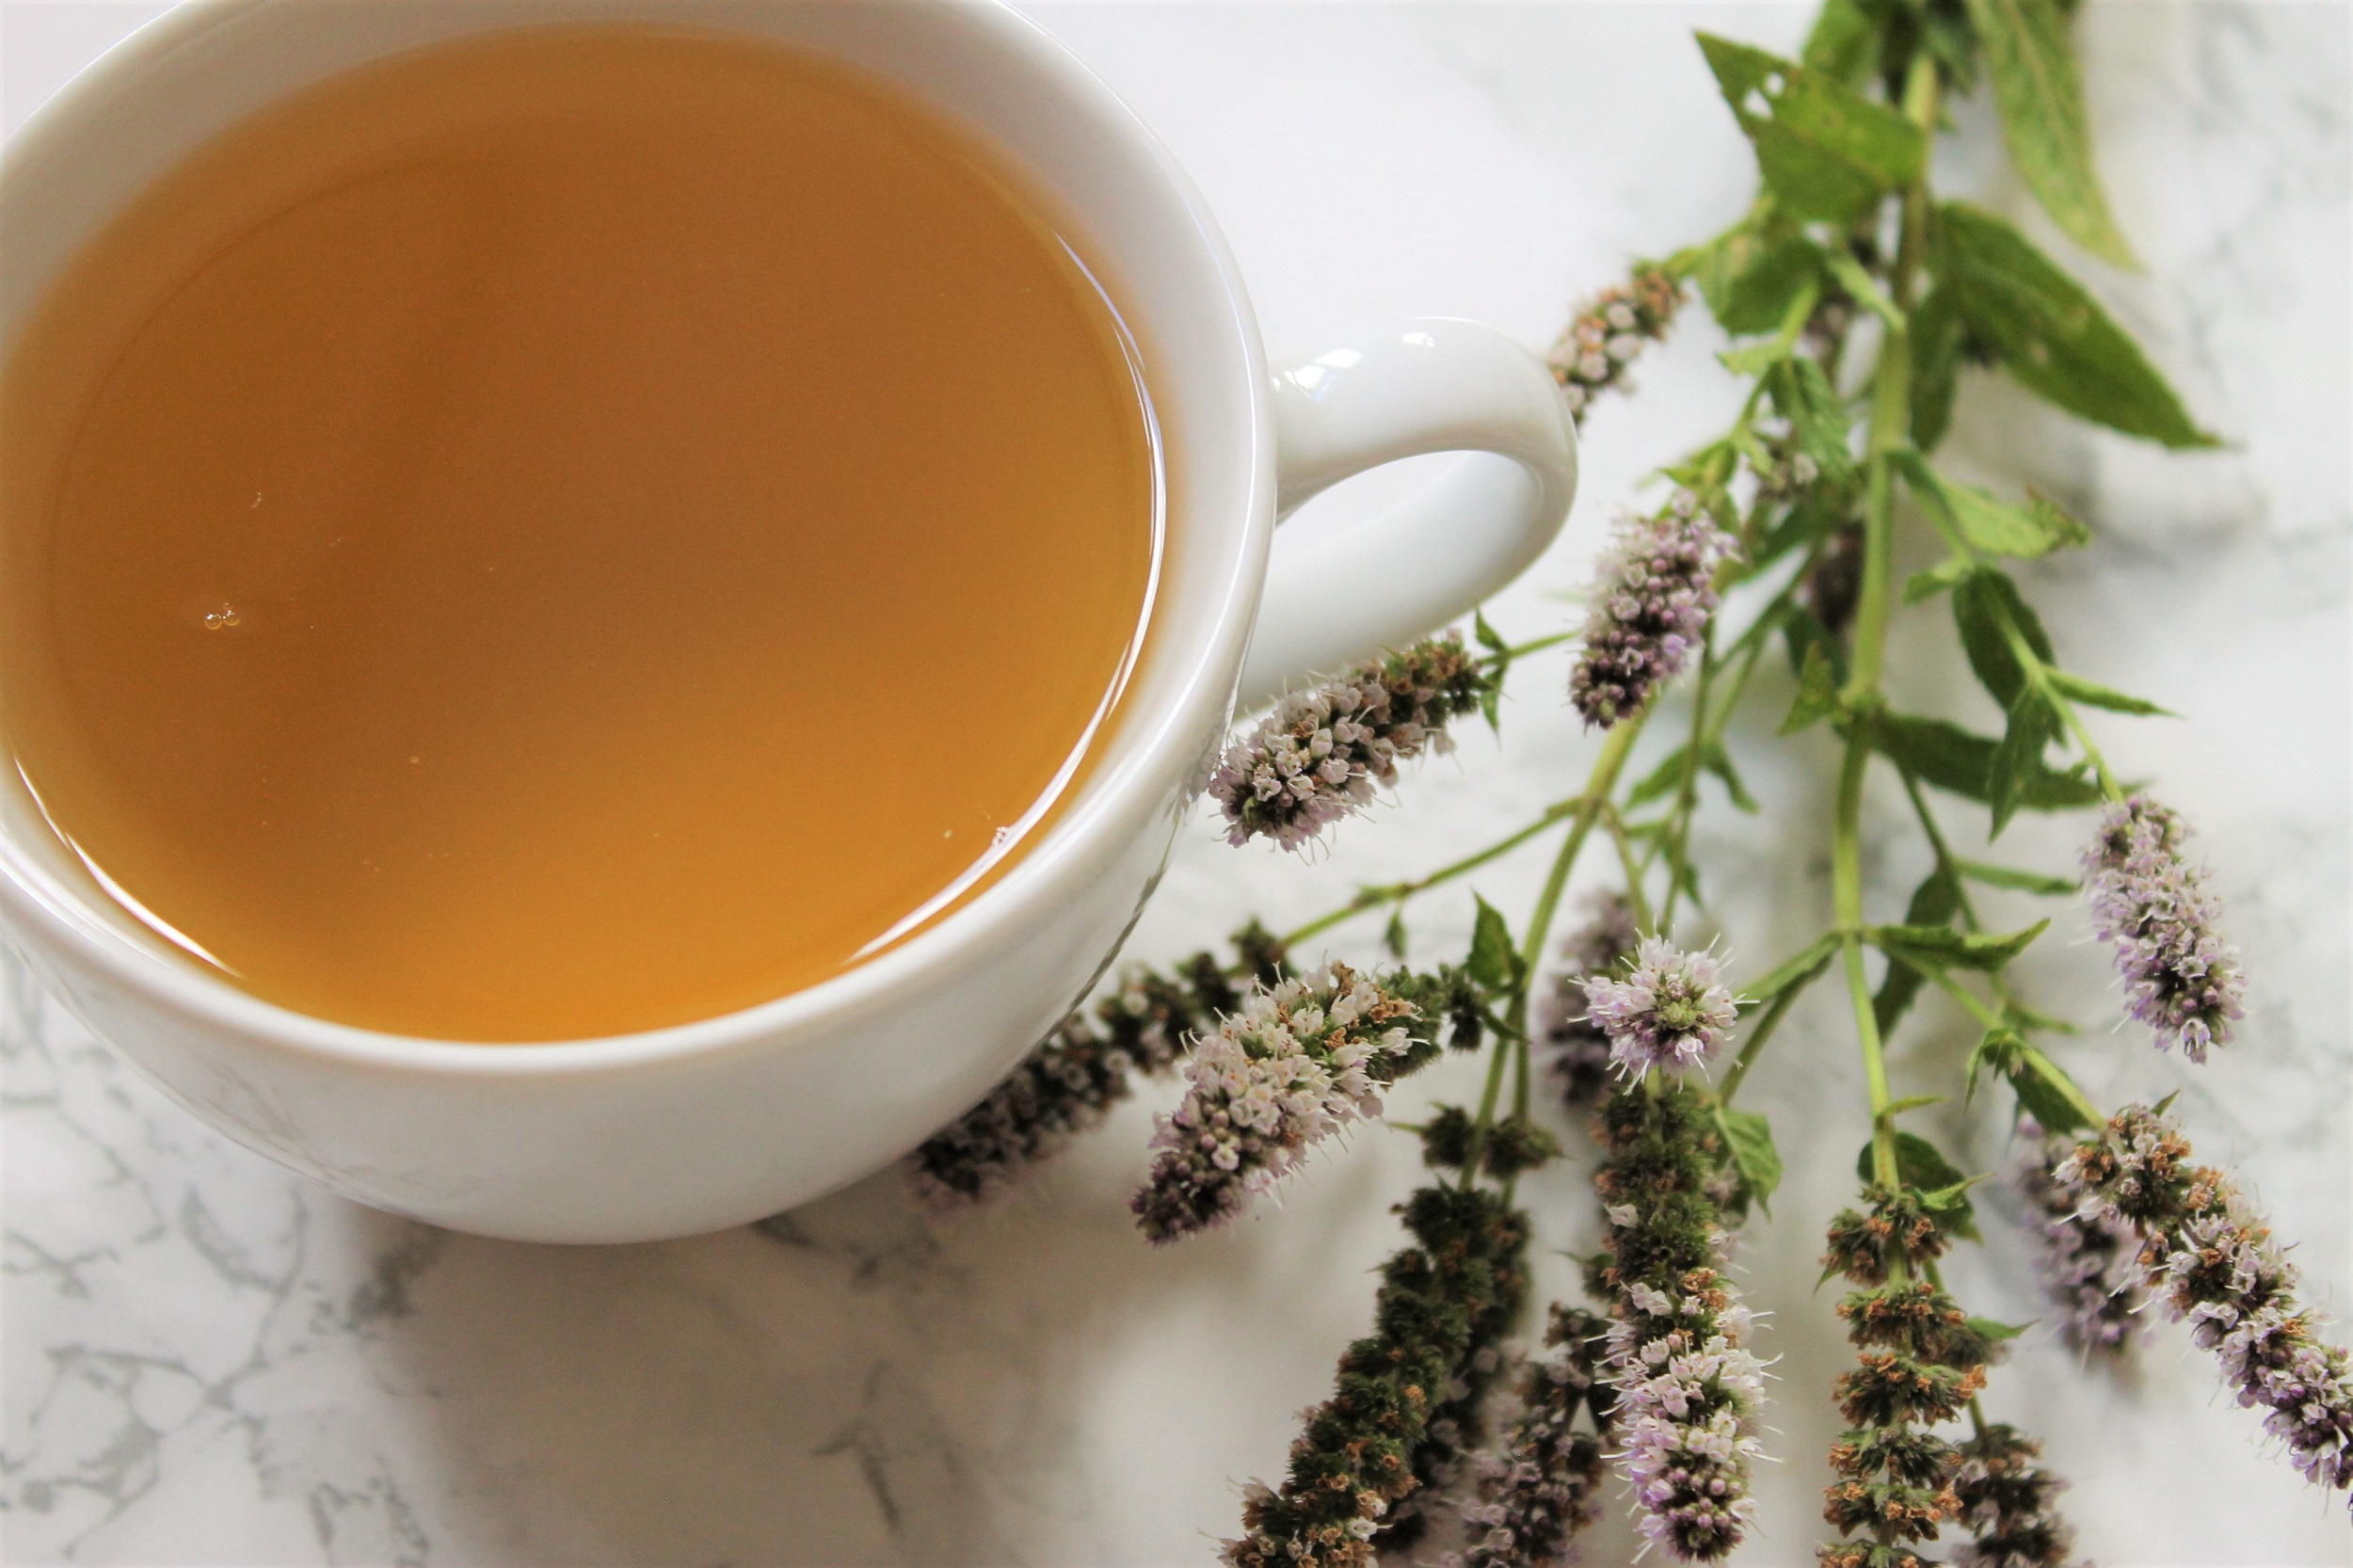 basilur leaf of ceylon green tea